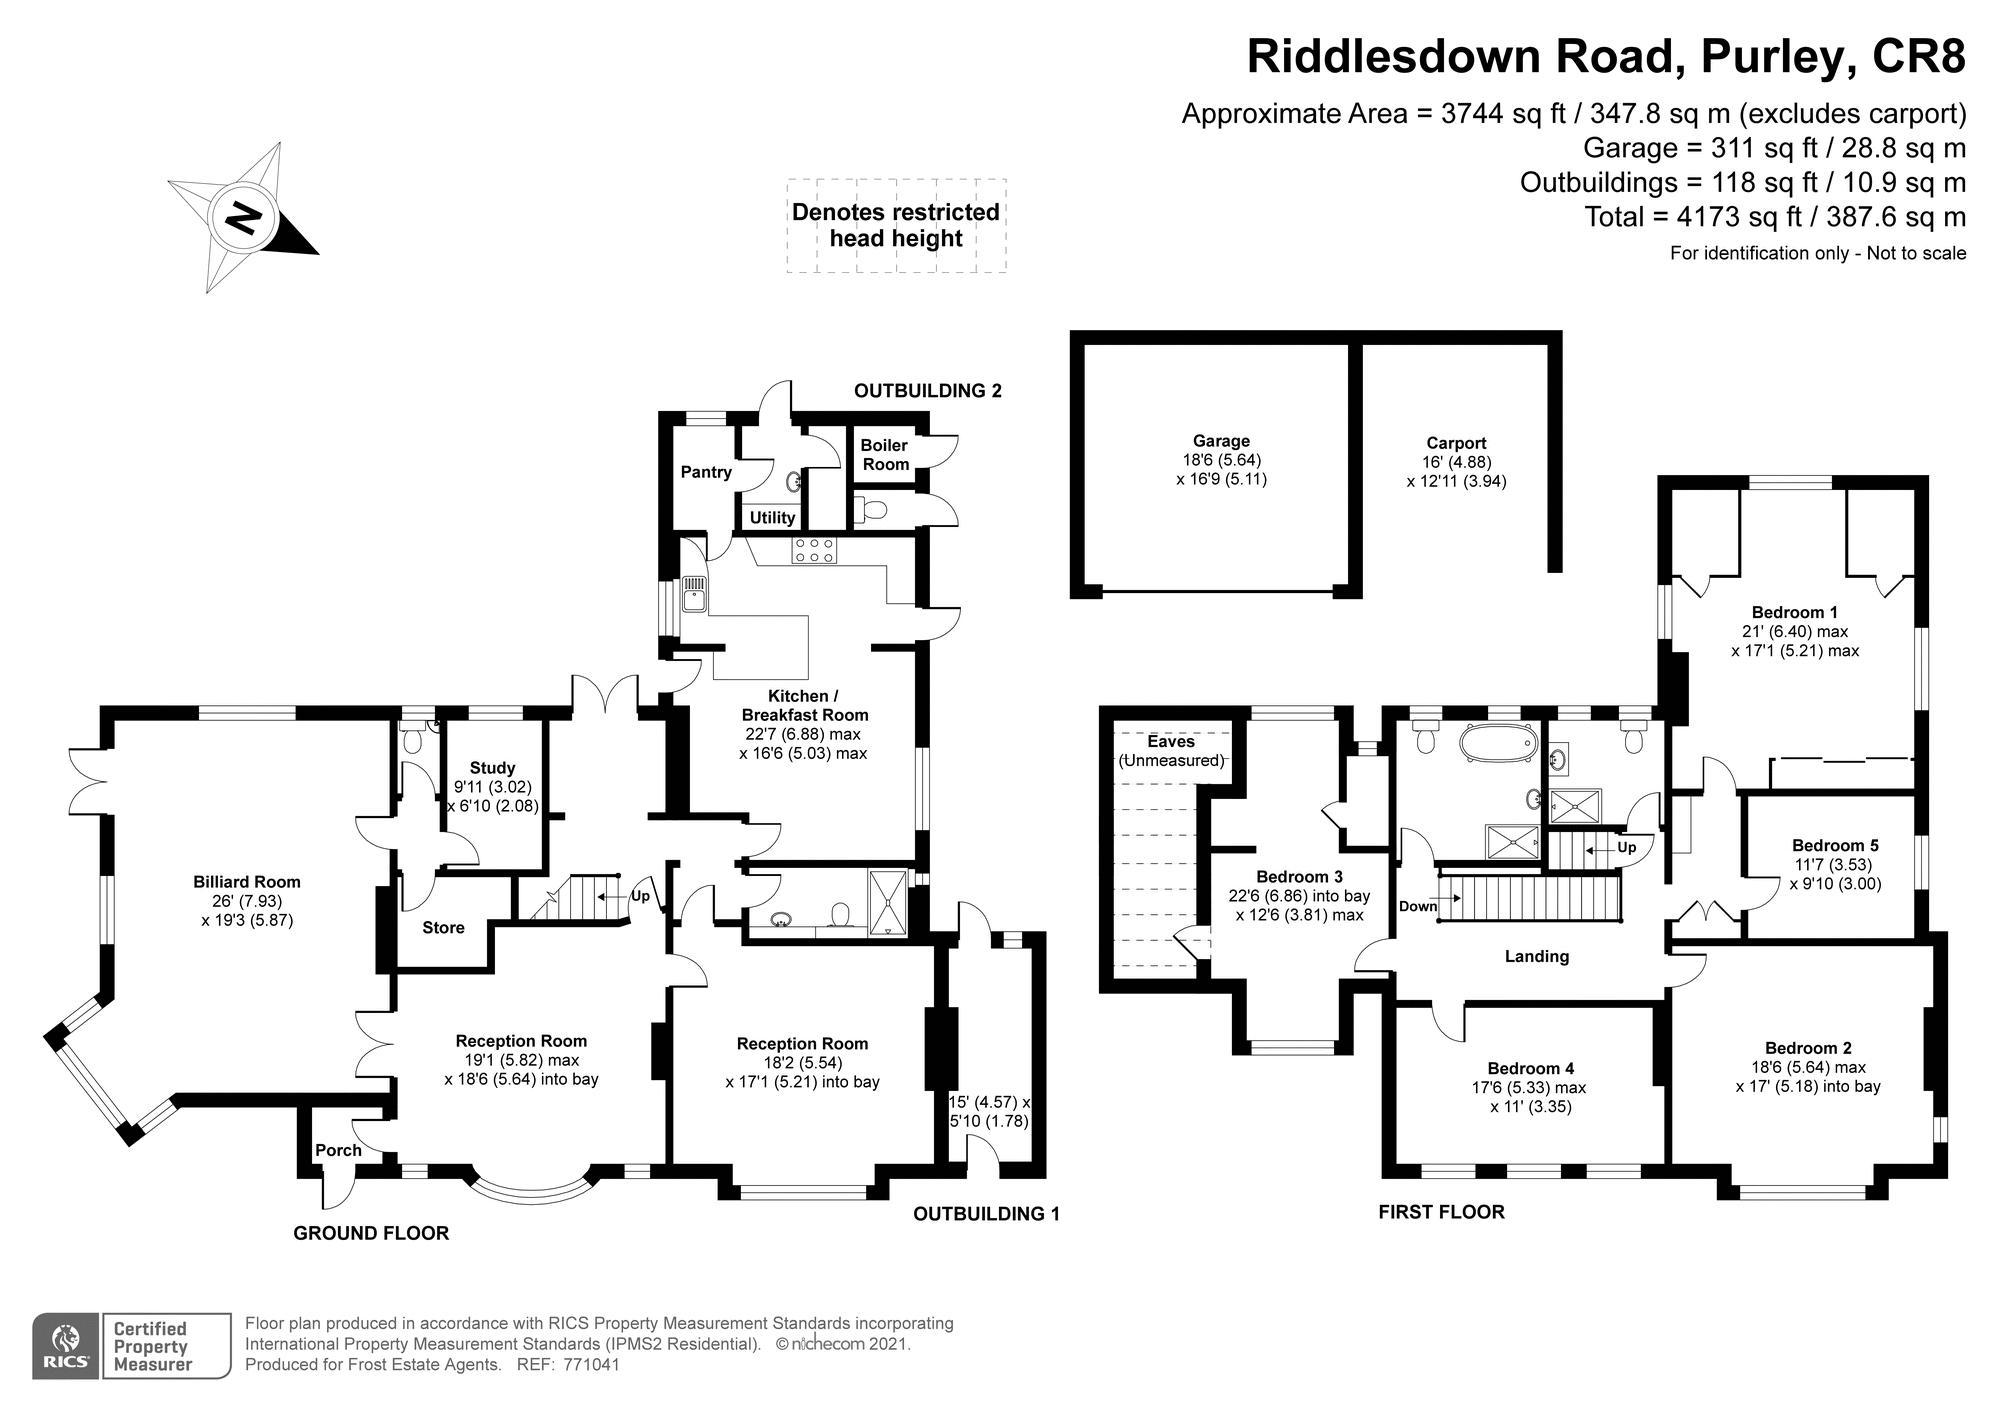 Riddlesdown Road